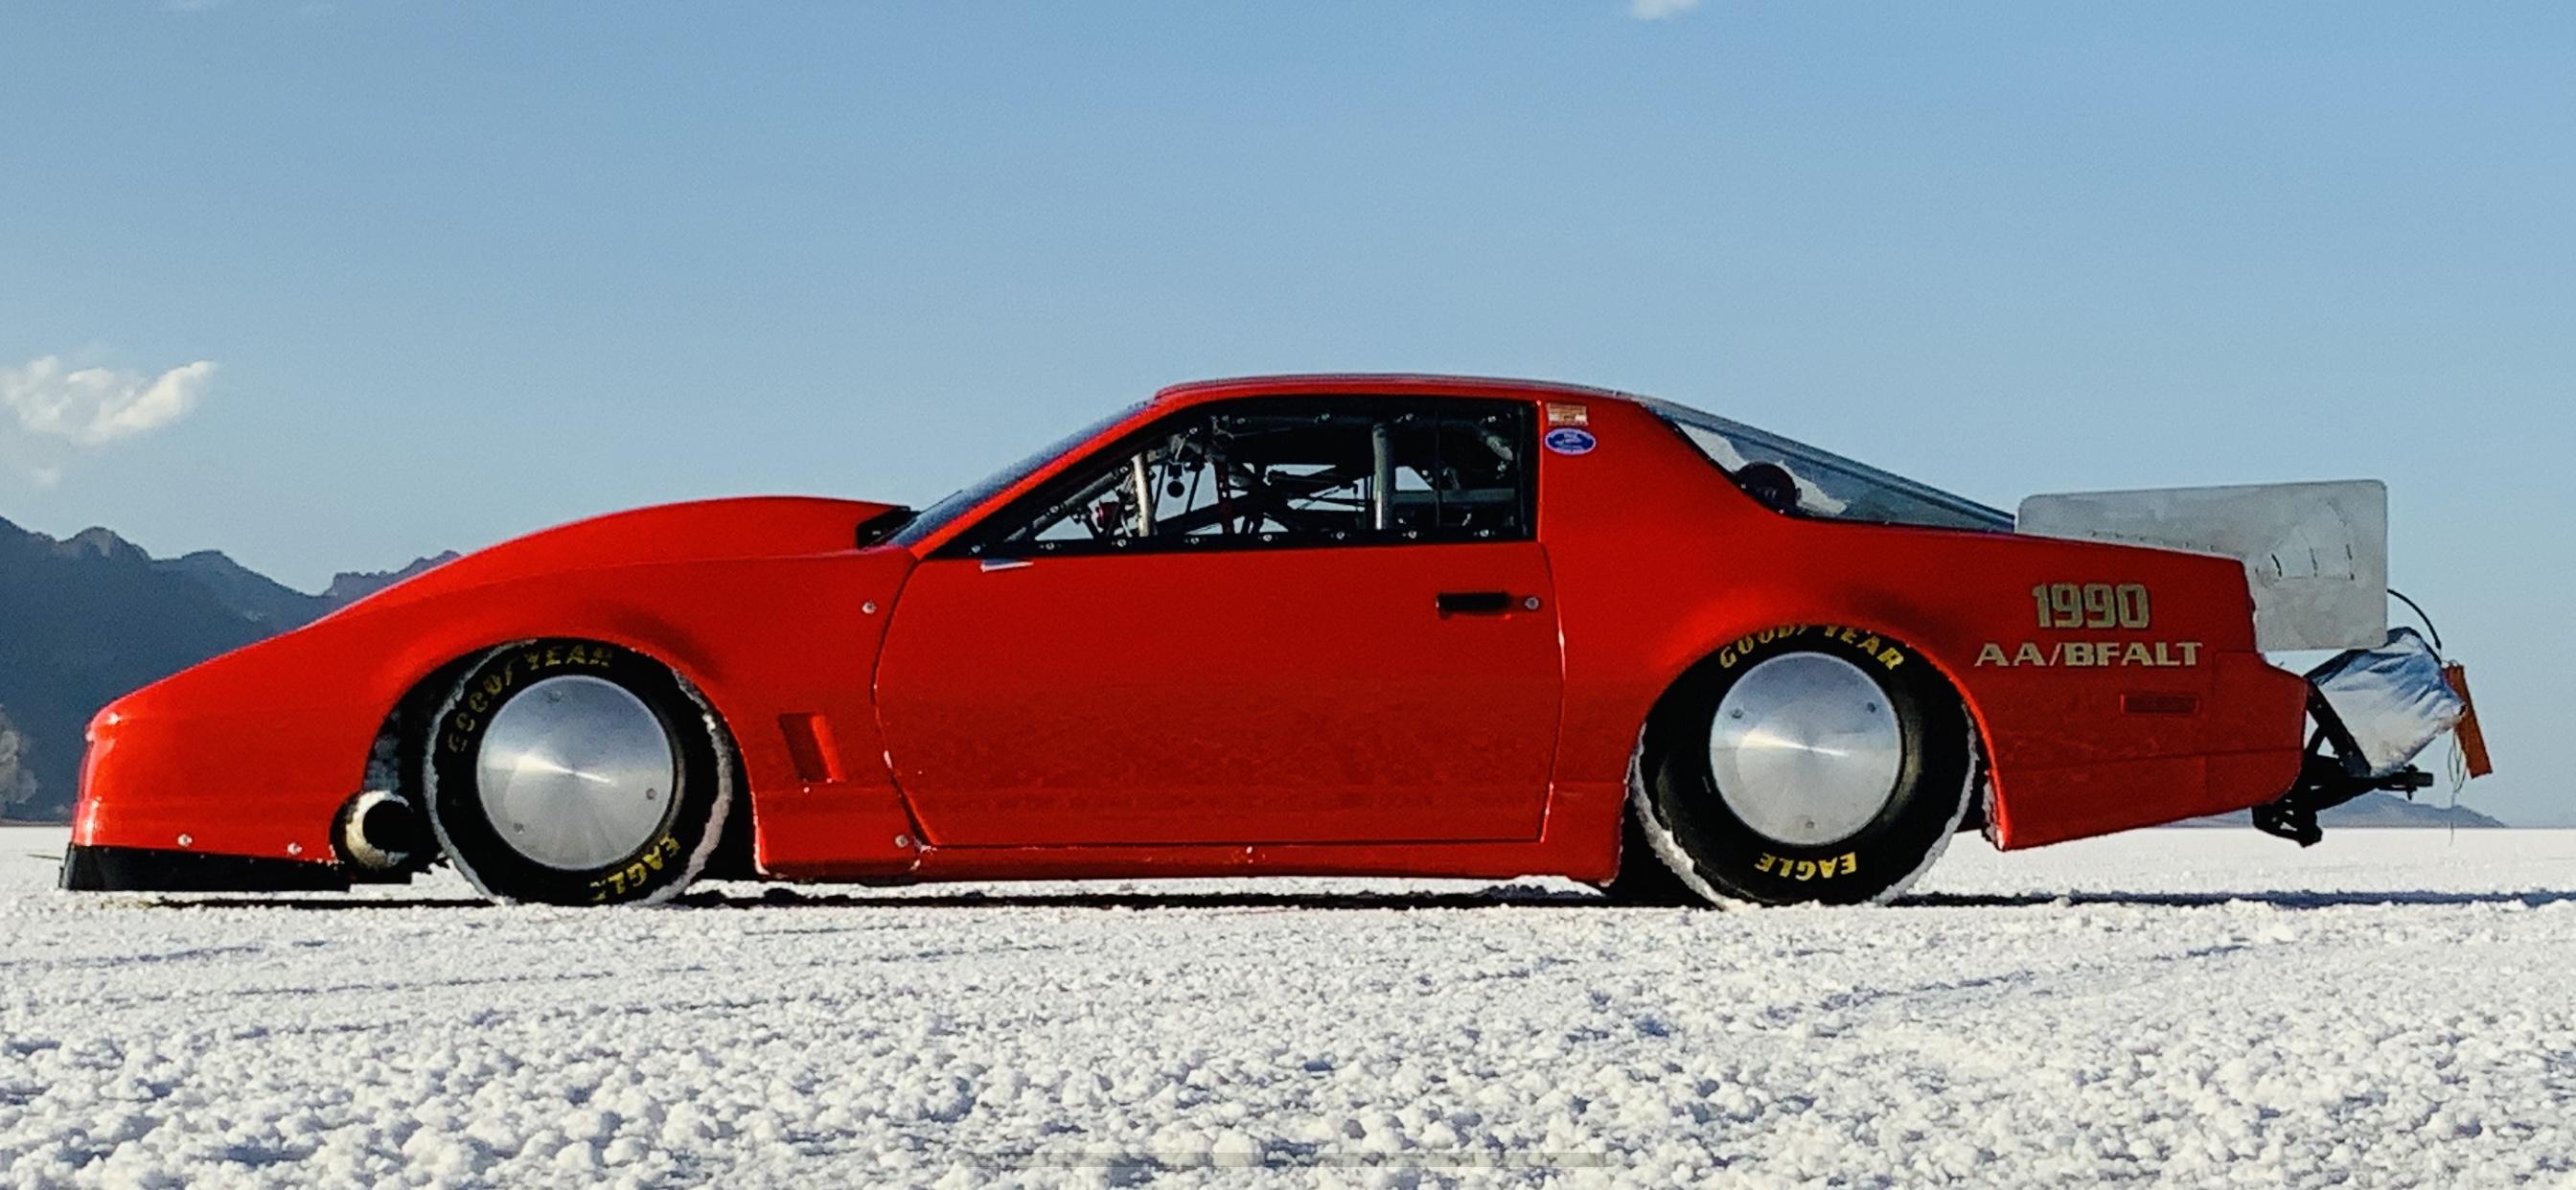 Watch The Team Built Buckwheat Racing Trans Am Go 288 mph From Inside The Car At Bonneville Last Week!